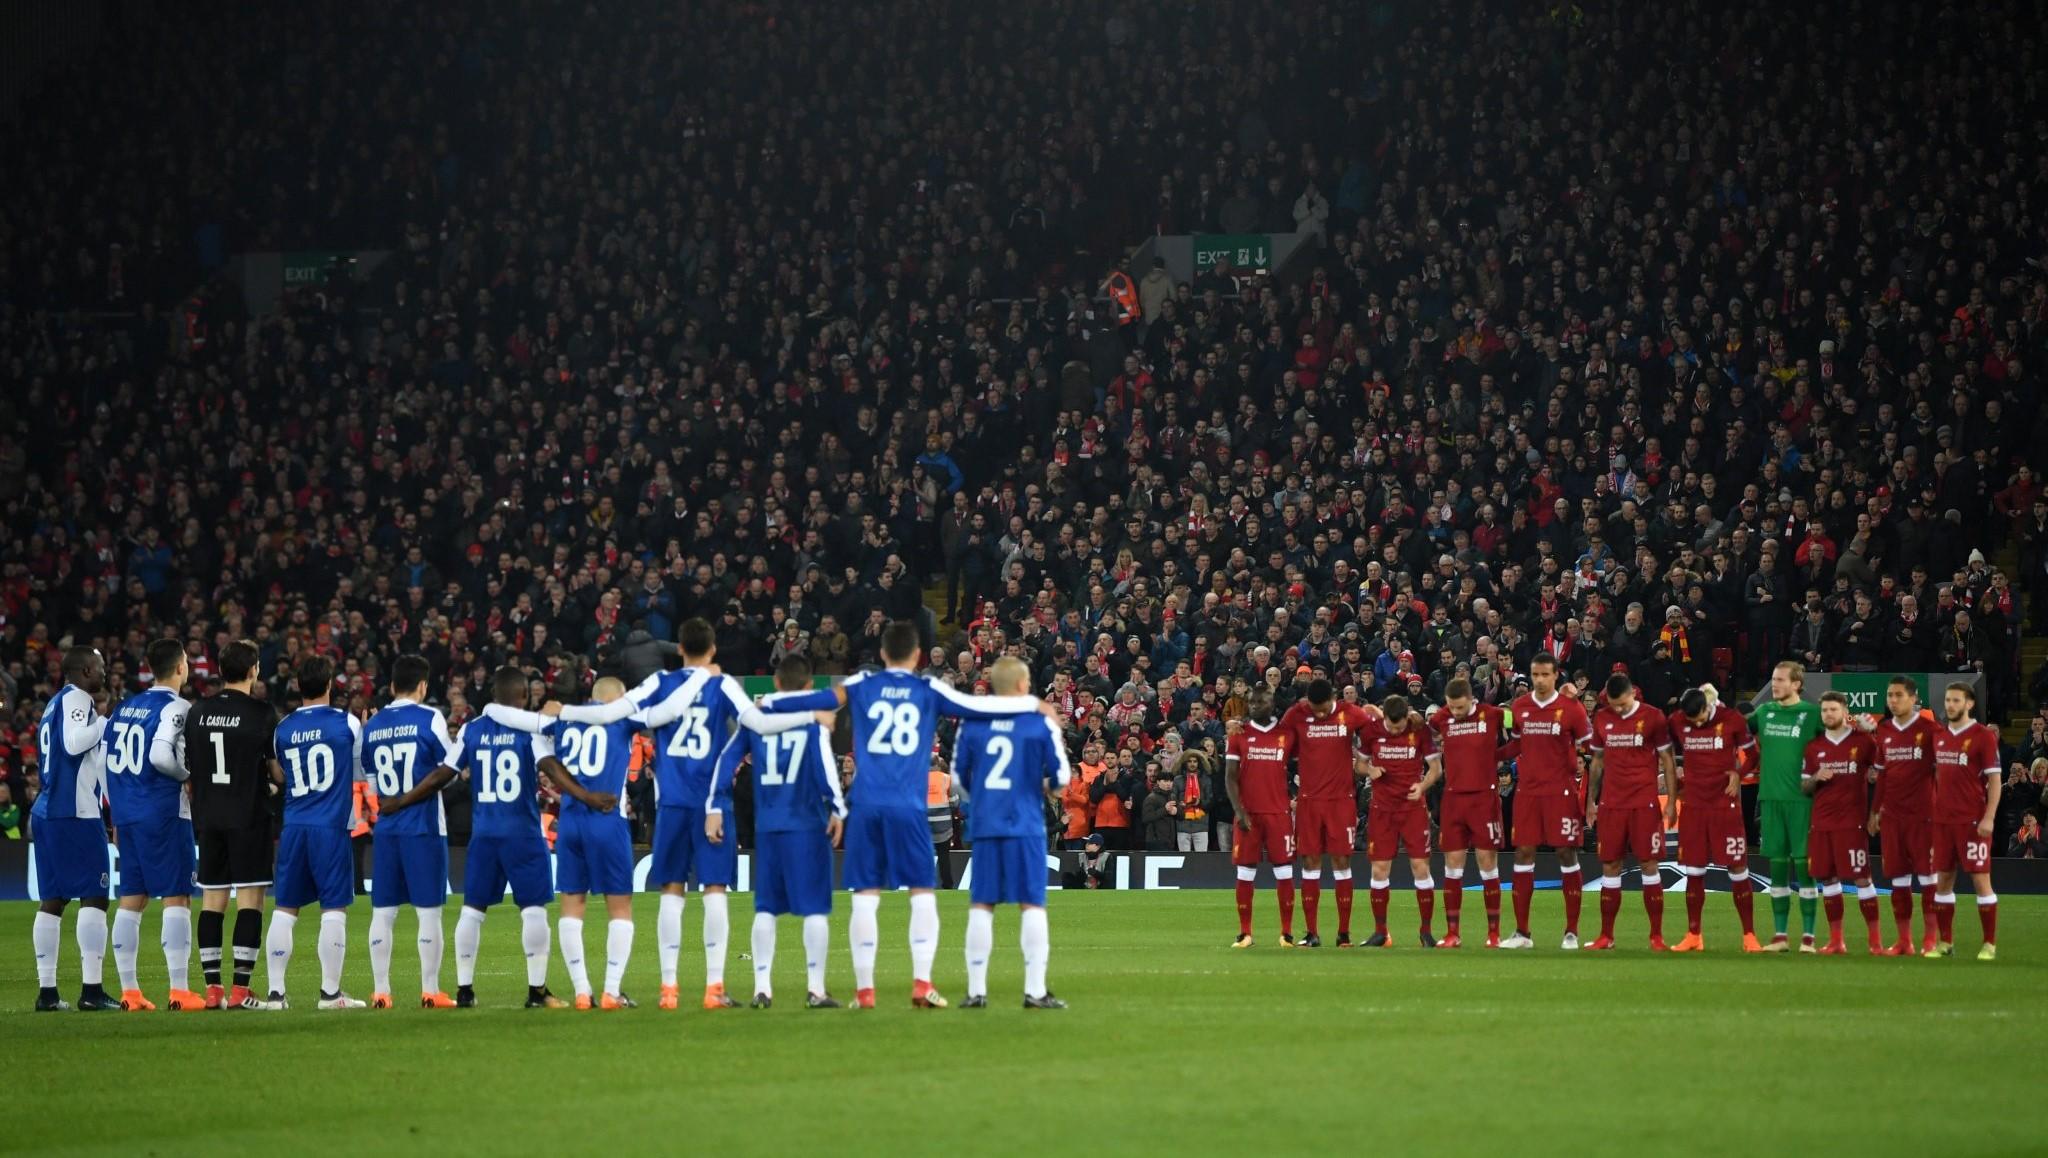 Liverpool-Porto: diretta tv su Sky Sport, pronostico a favore dei Reds